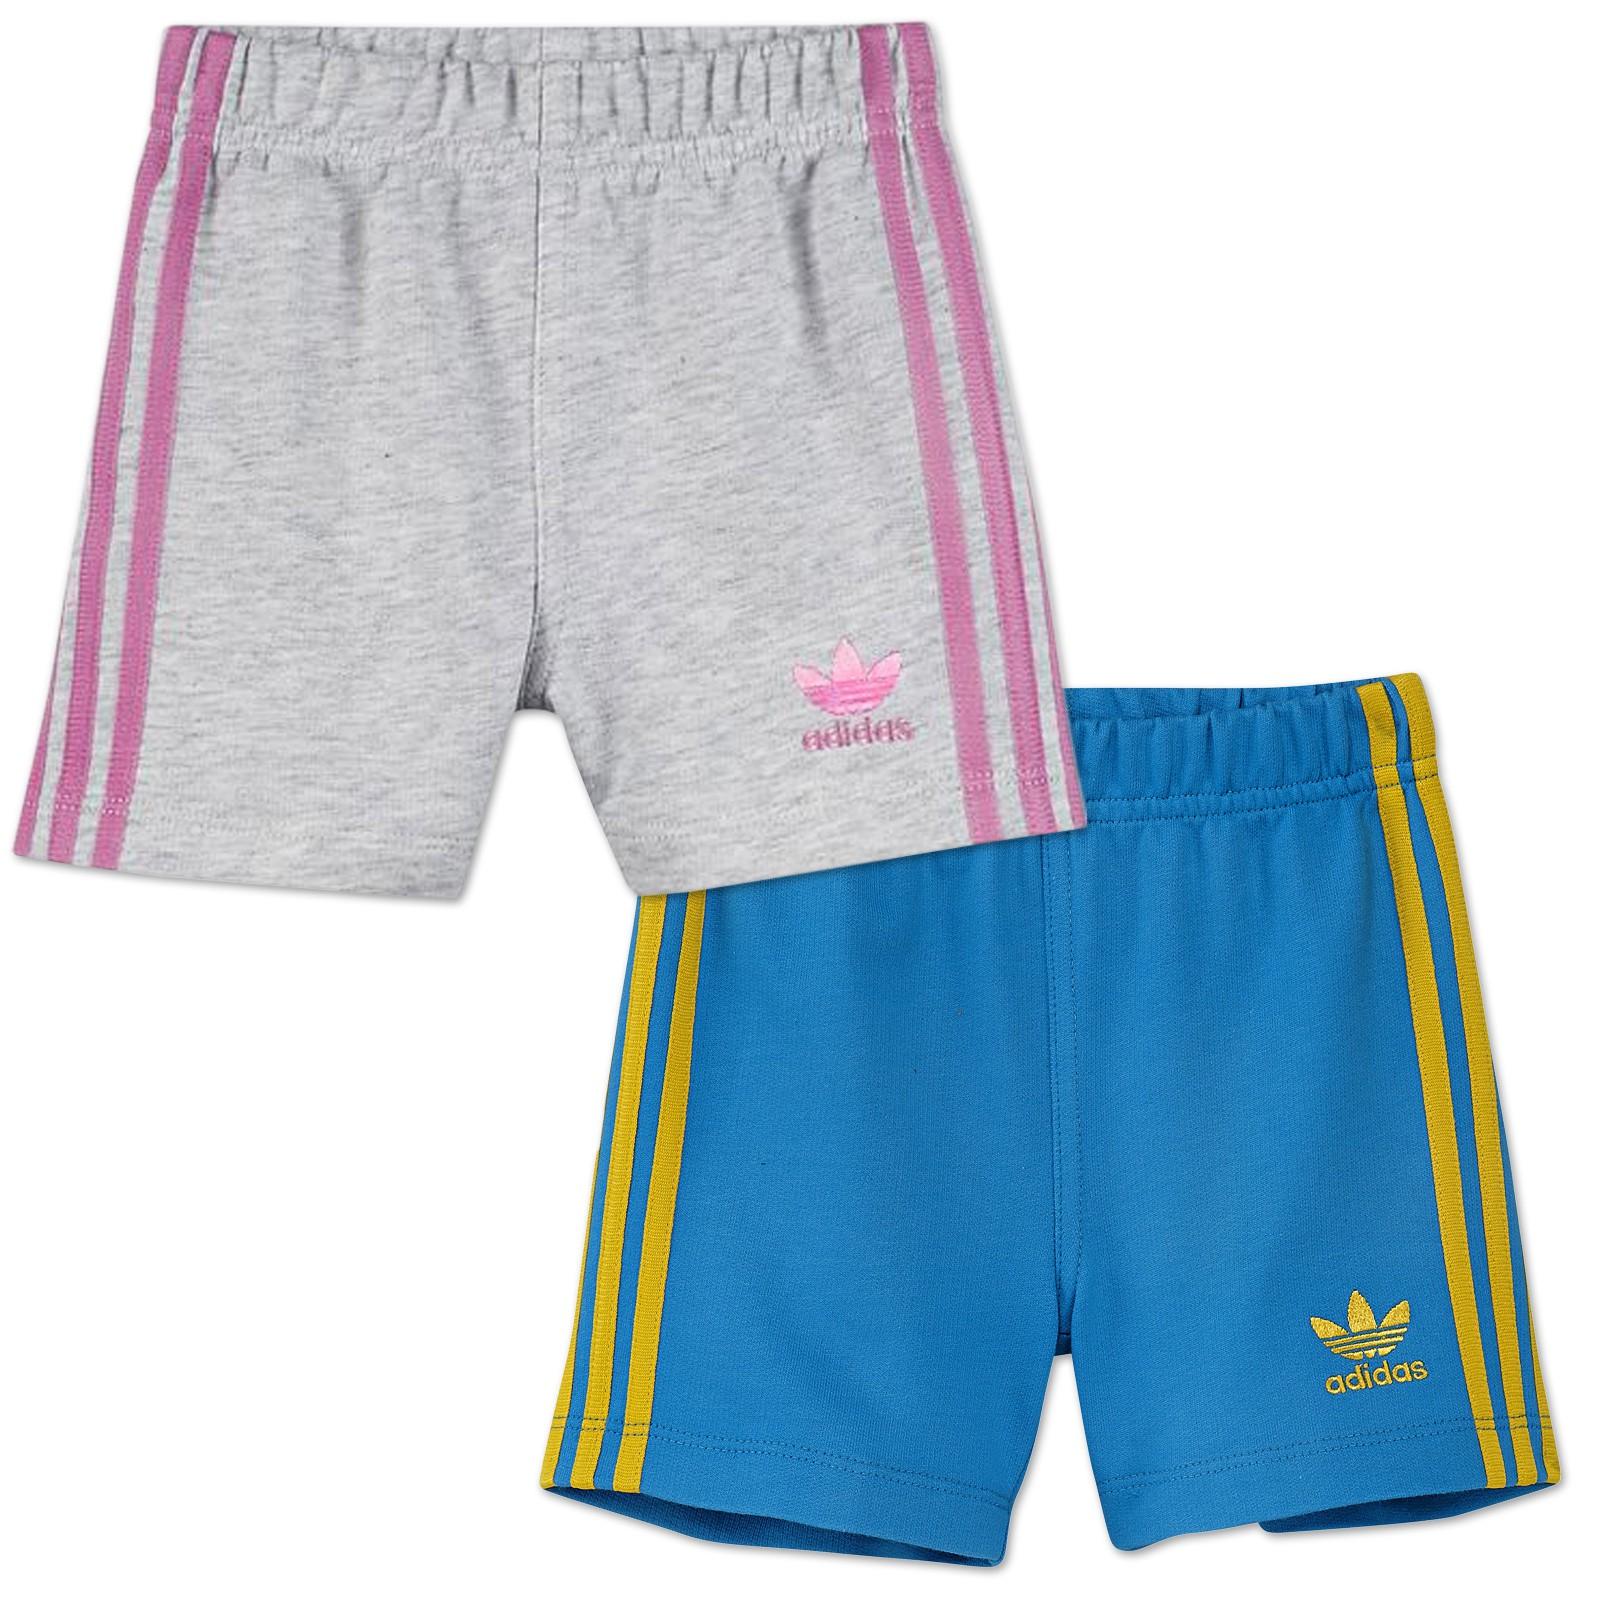 adidas sporthose für Jungs